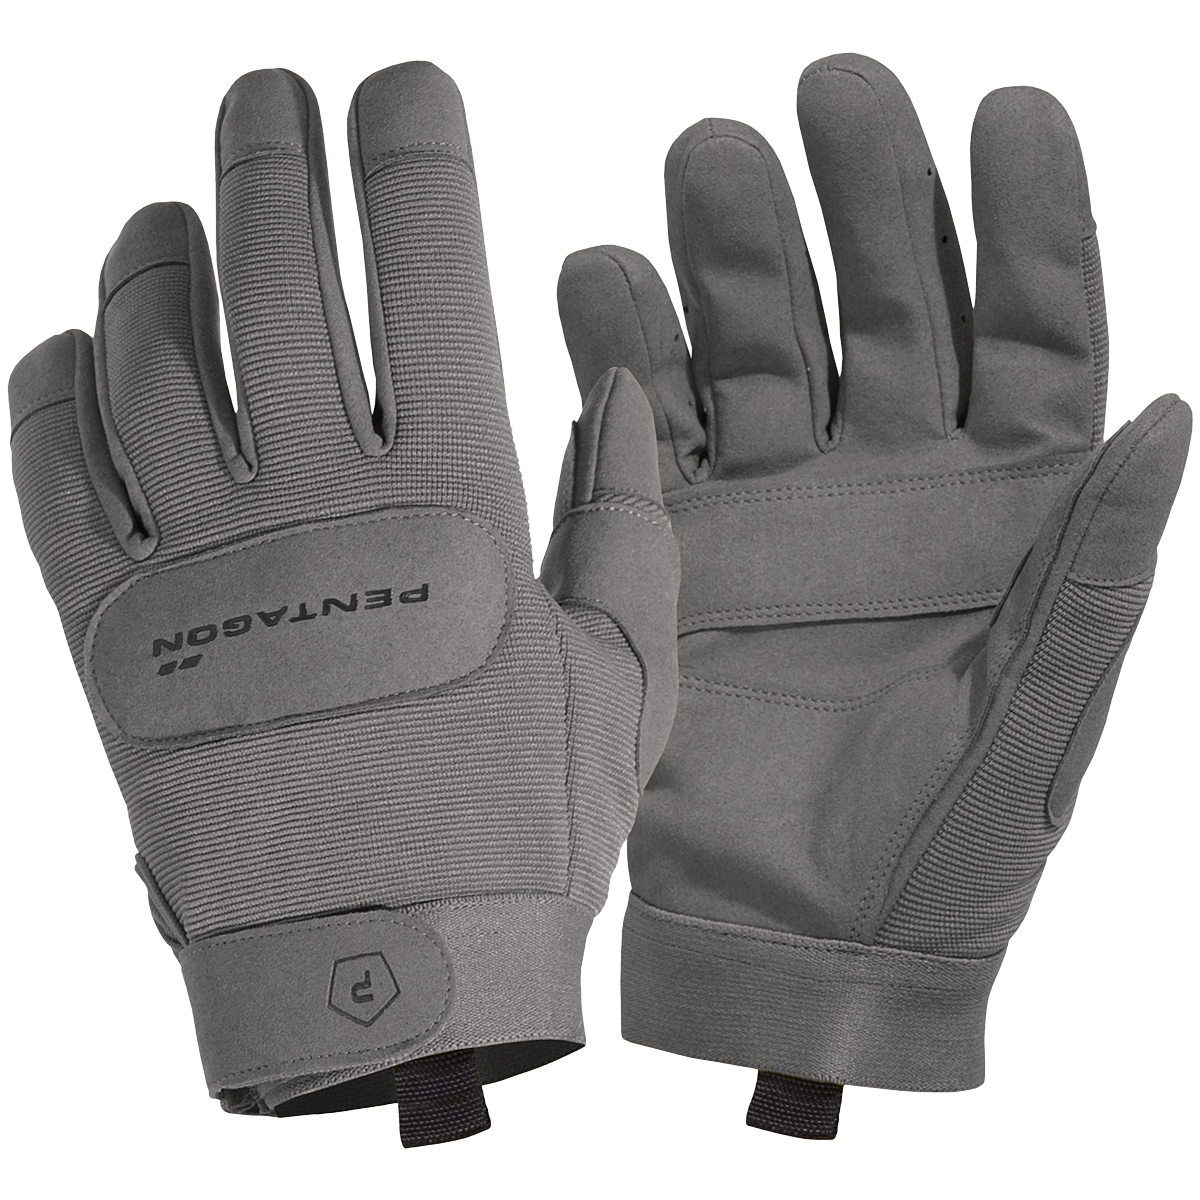 Pentagon Mens 1//2 Duty Mechanic Gloves Coyote